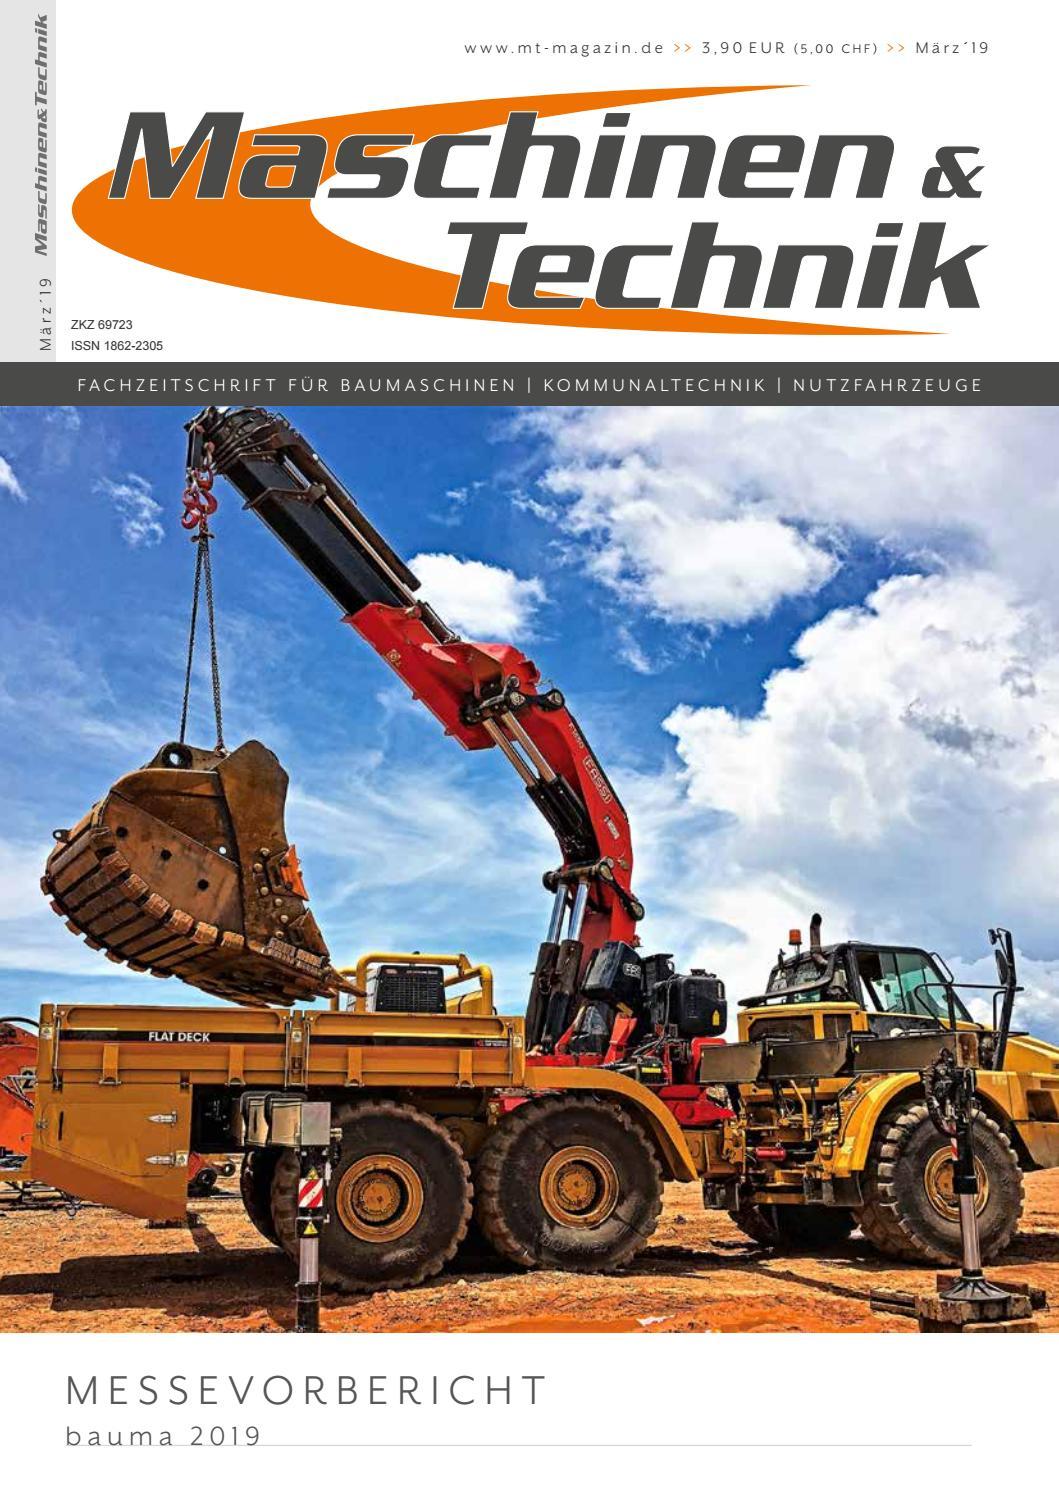 Begeistert Werbeblatt Kubota Kettendumper Kataloge & Prospekte Business & Industrie